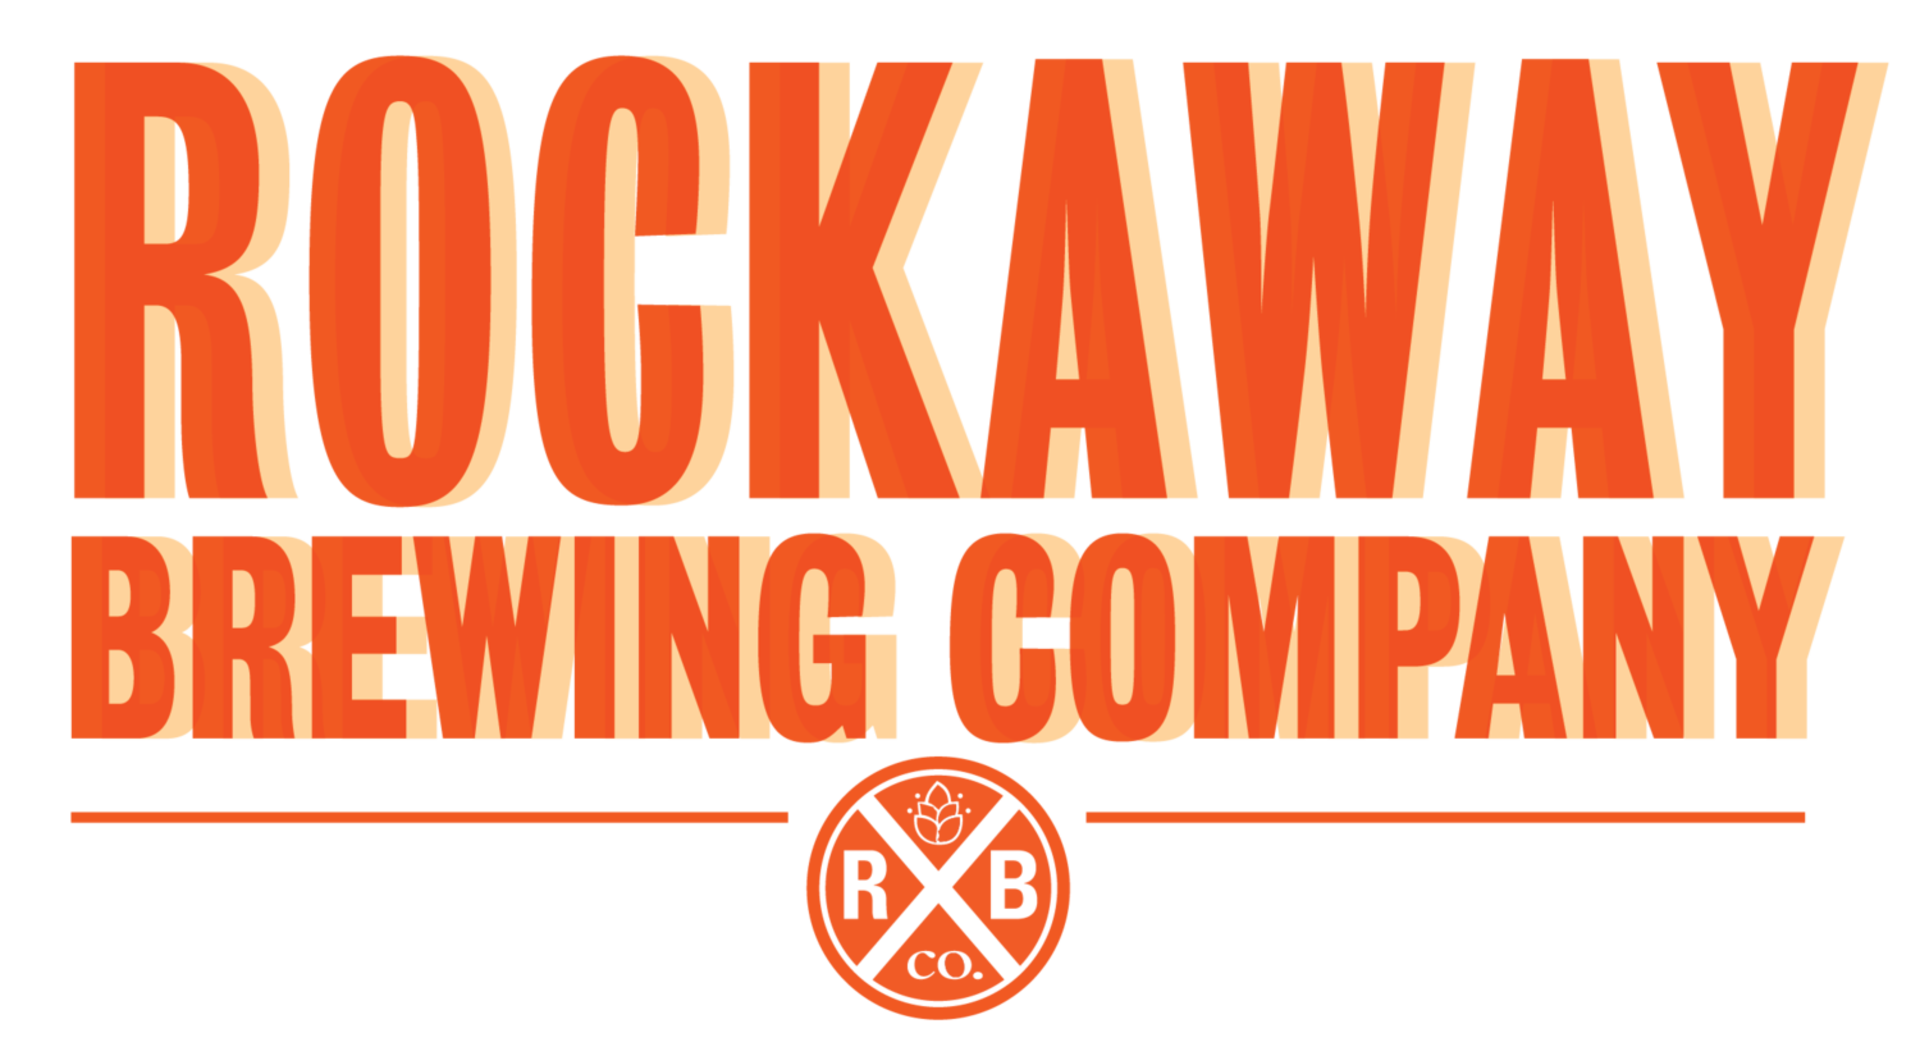 ROCKAWAY BREWING COMPANY AT THE BEACH!